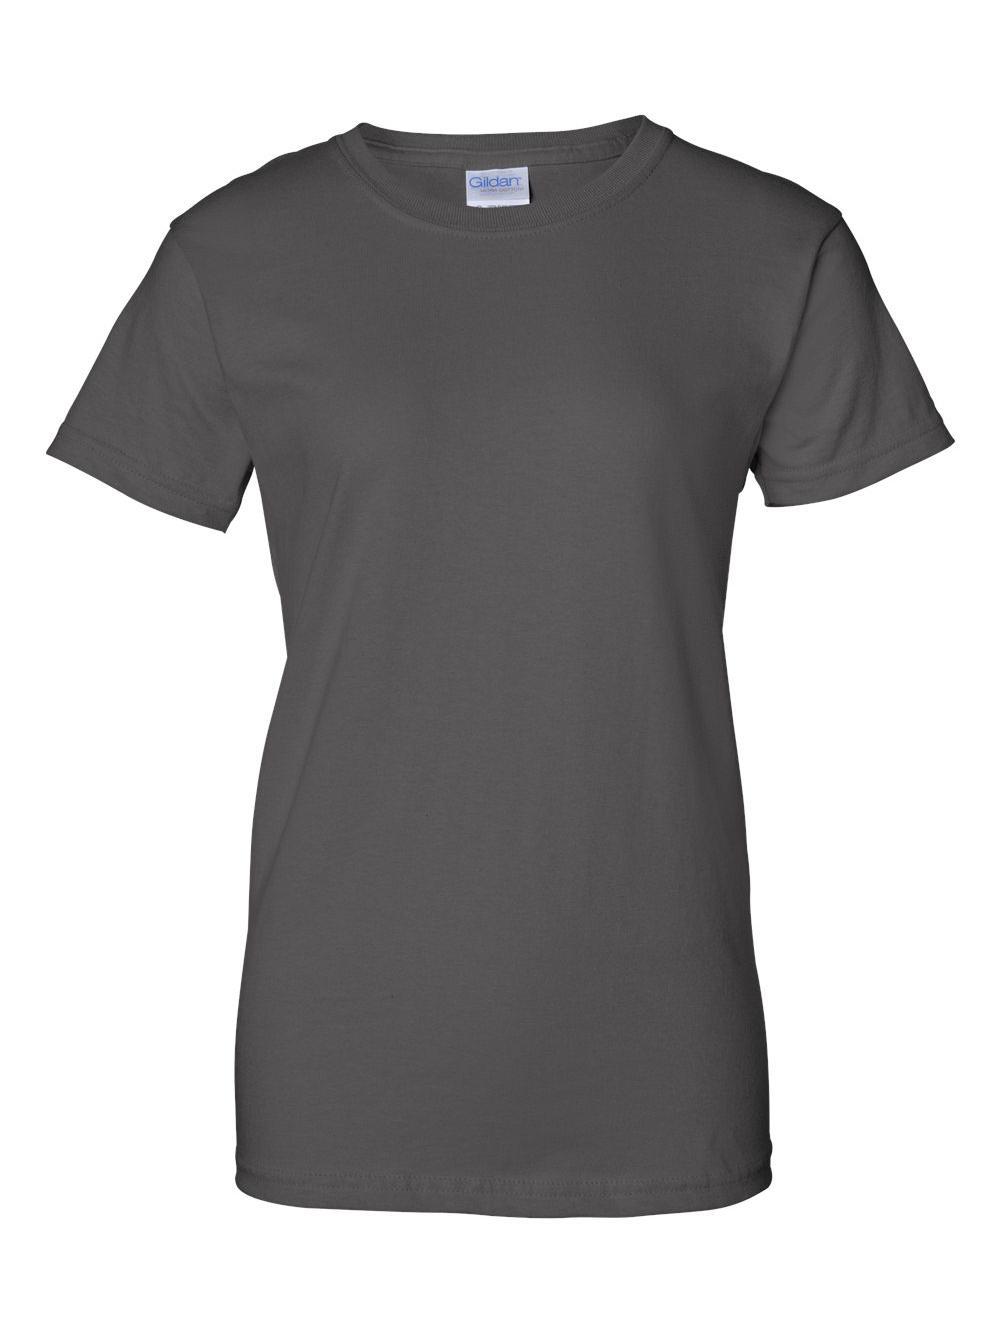 Gildan-Ultra-Cotton-Women-039-s-T-Shirt-2000L thumbnail 9